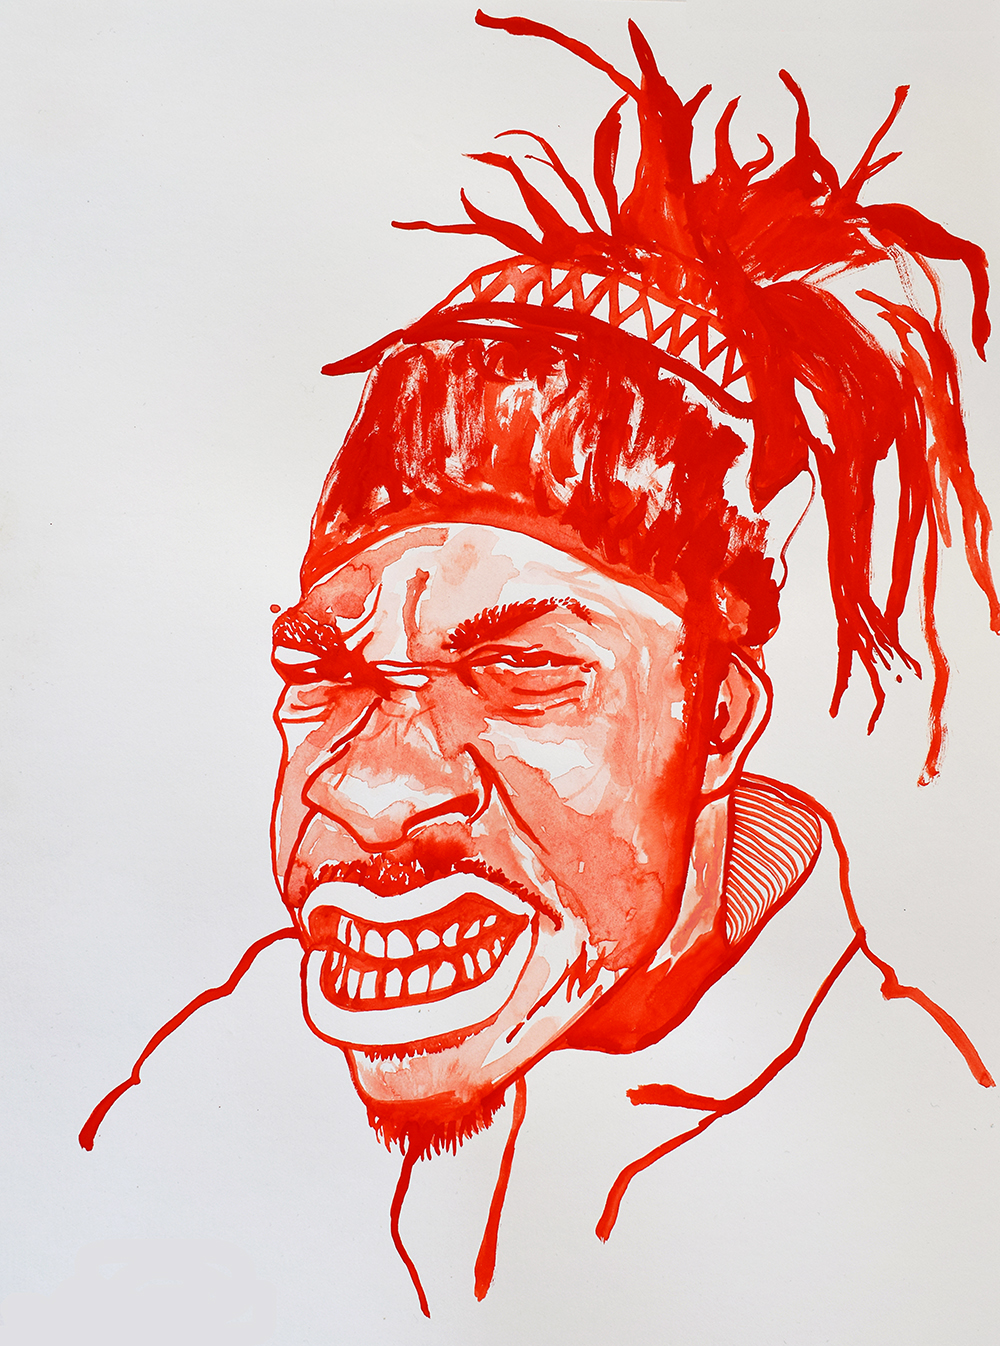 `Busta Rhymes', 29.7 x 42.0cm, watercolour on 230g akvarel paper, 2017